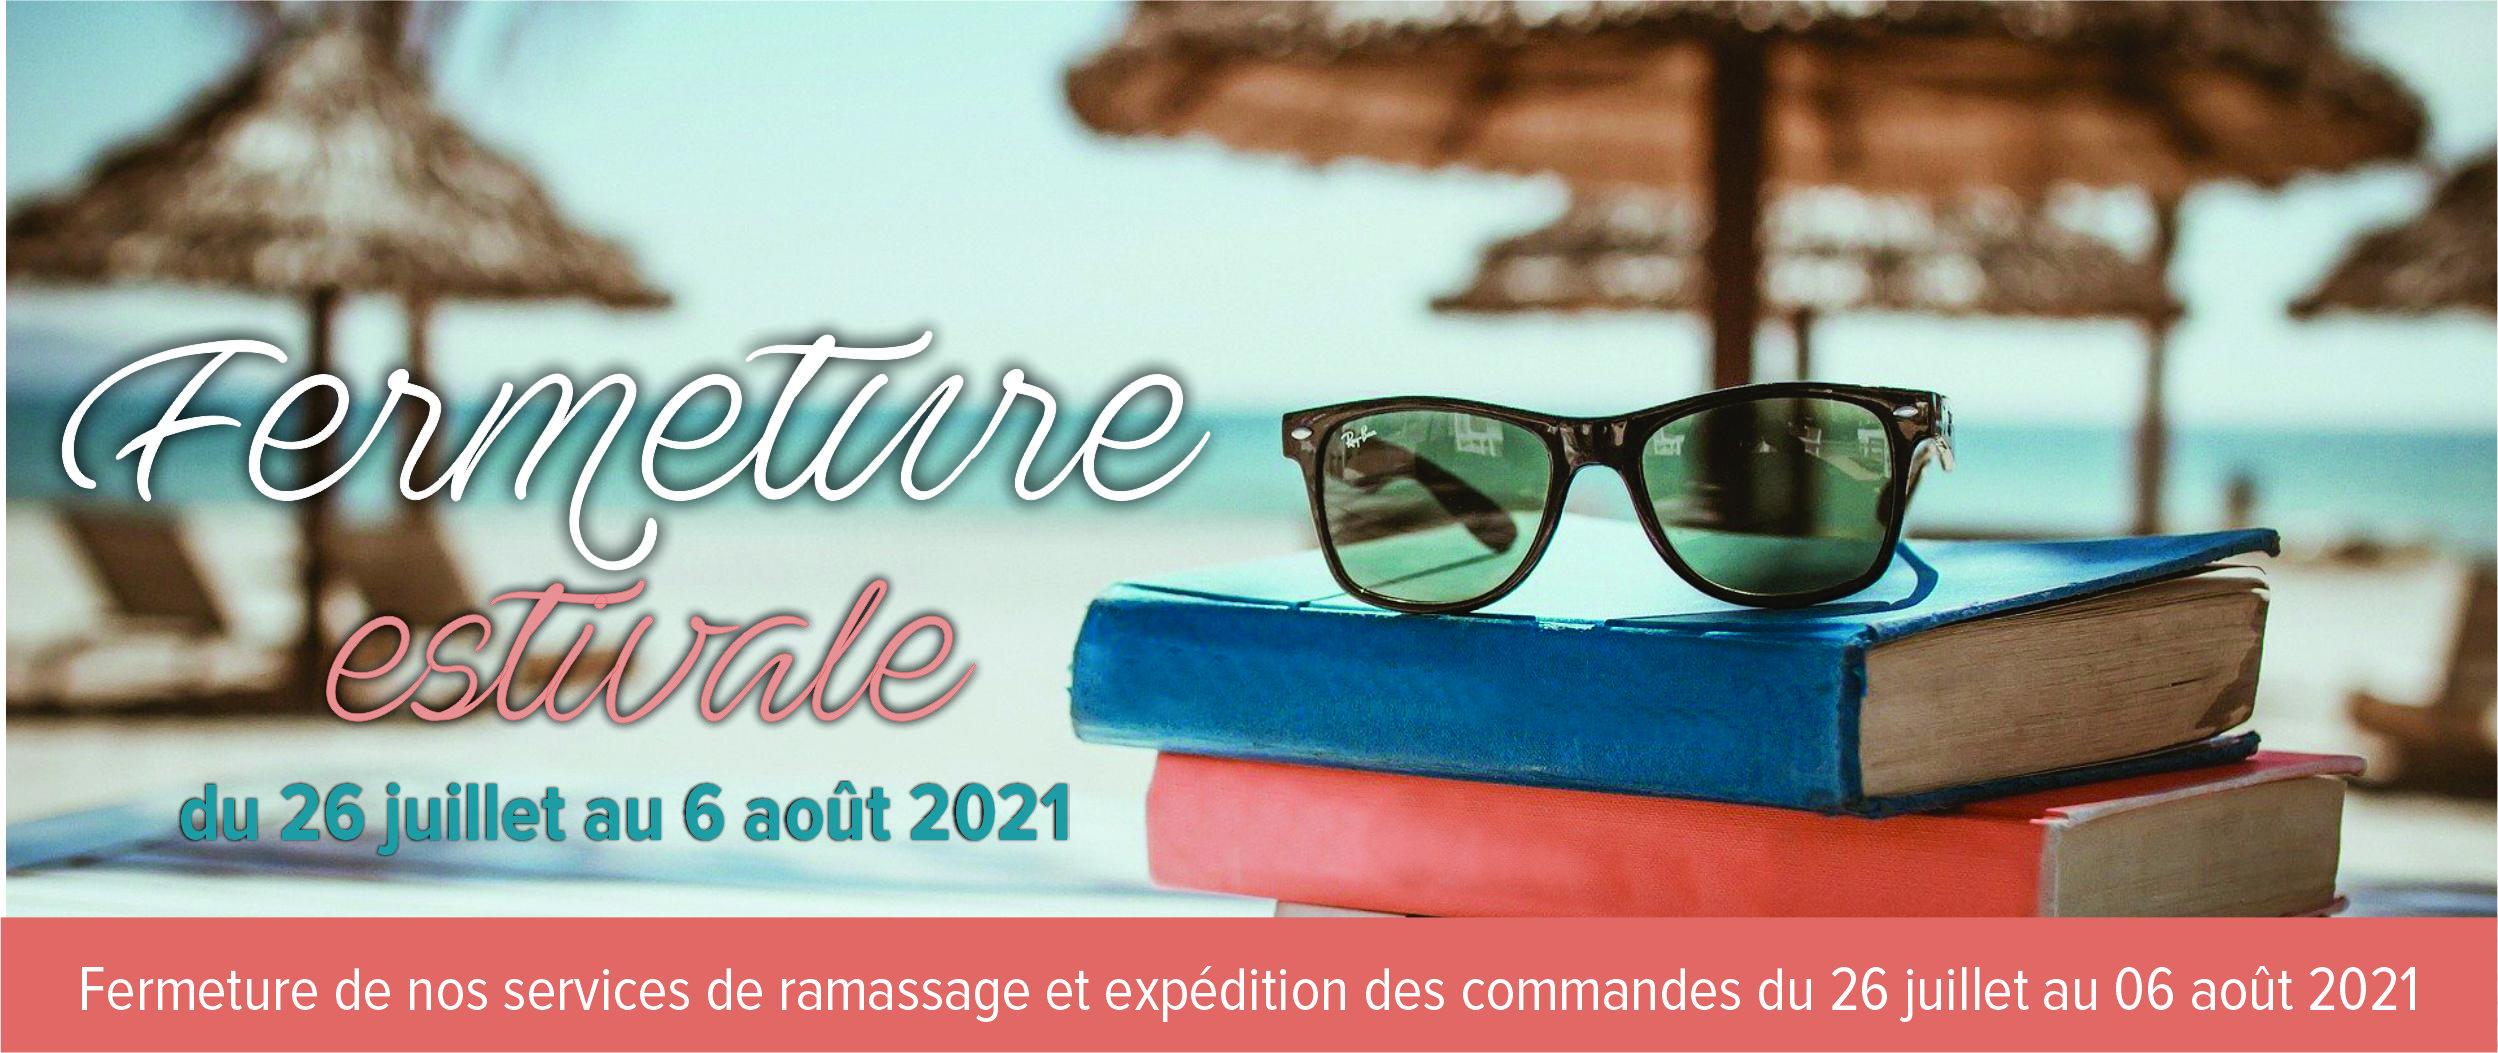 Fermeture_estivale_2021